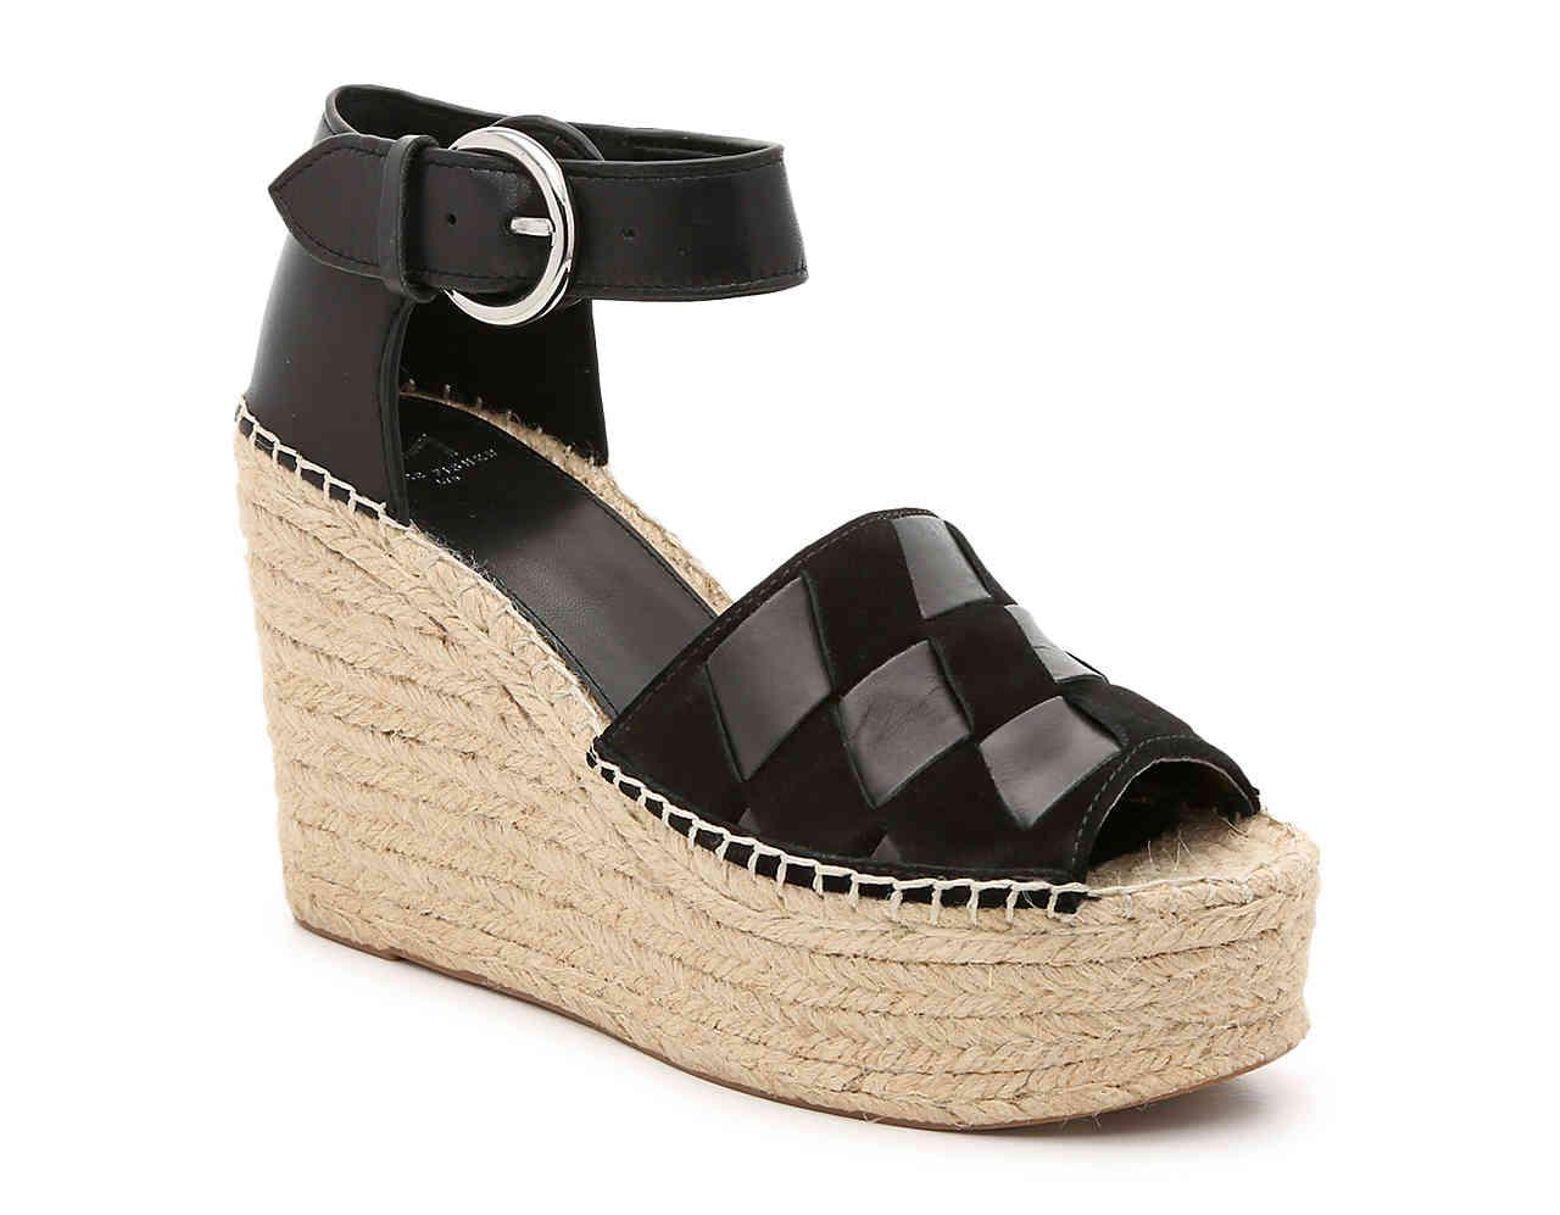 087916c4799 Women's Black Adalla Espadrille Wedge Sandal